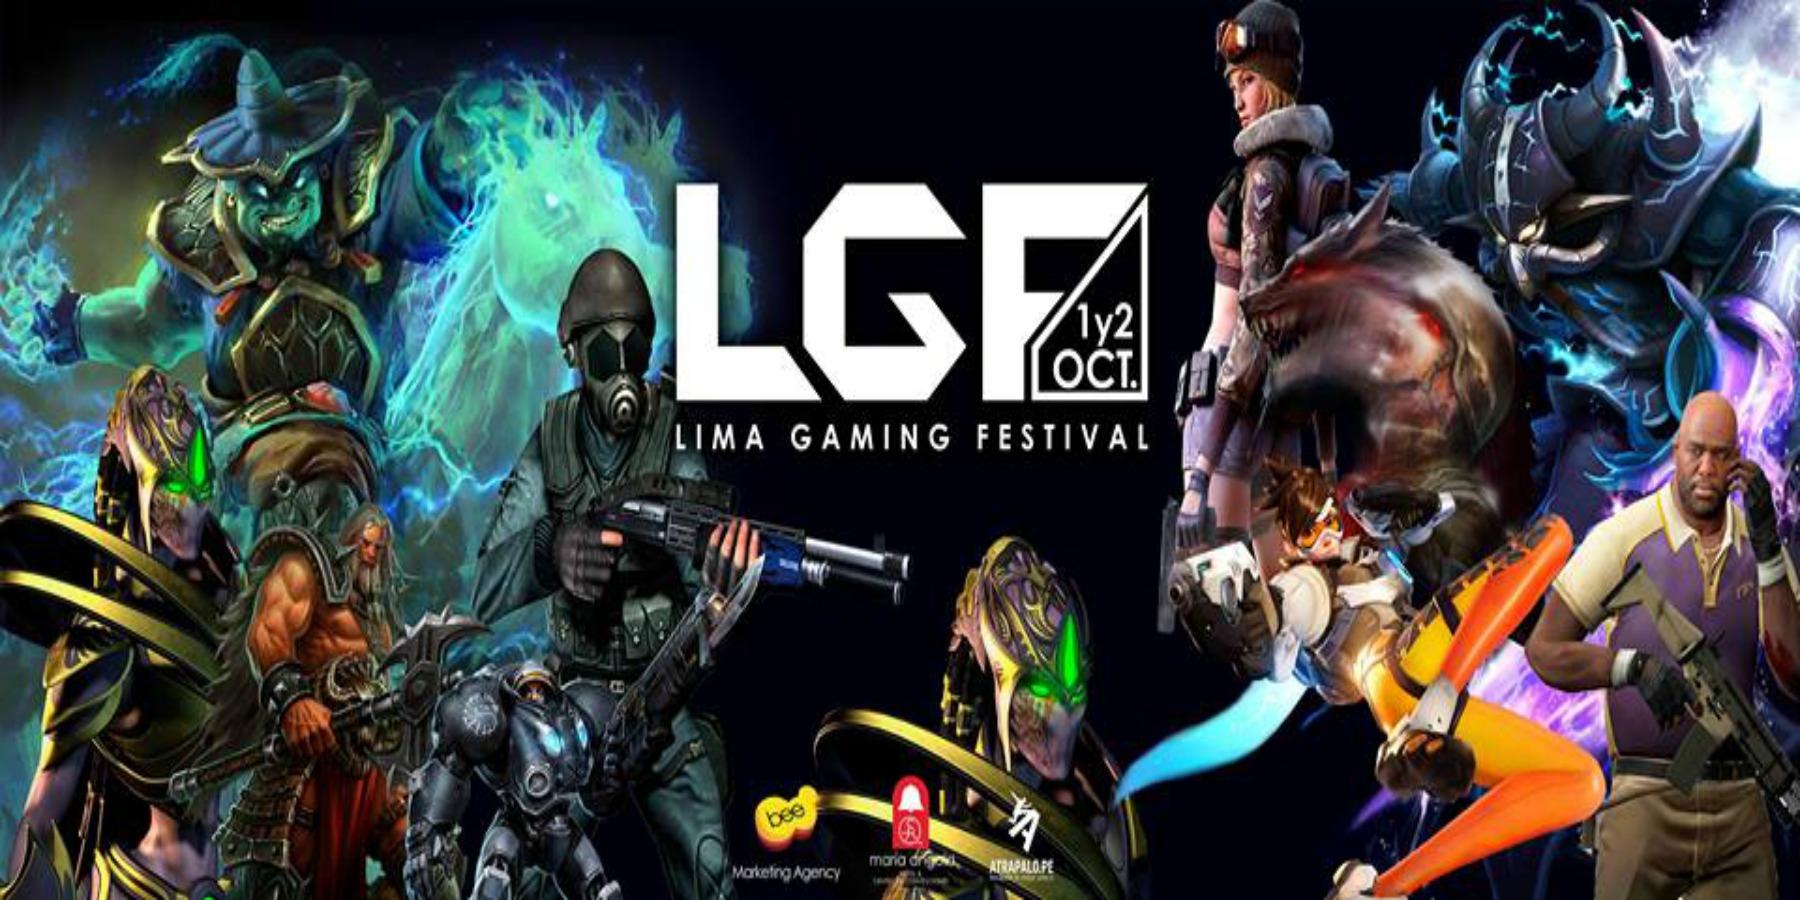 Lima Gaming Festival